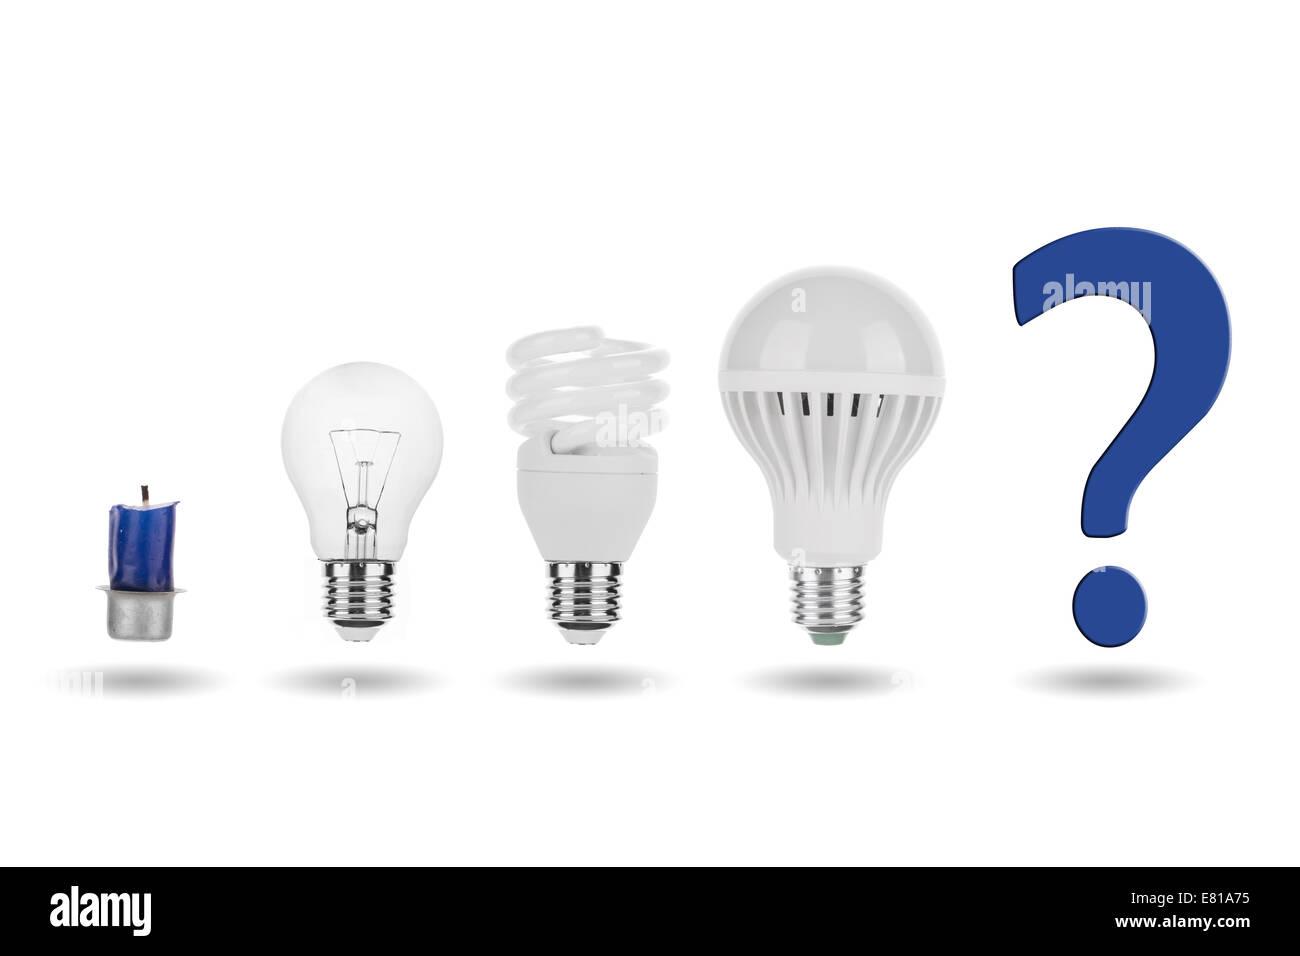 bombilla de fluorescentelámpara Evolution LEDlámpara MGzVpqUS